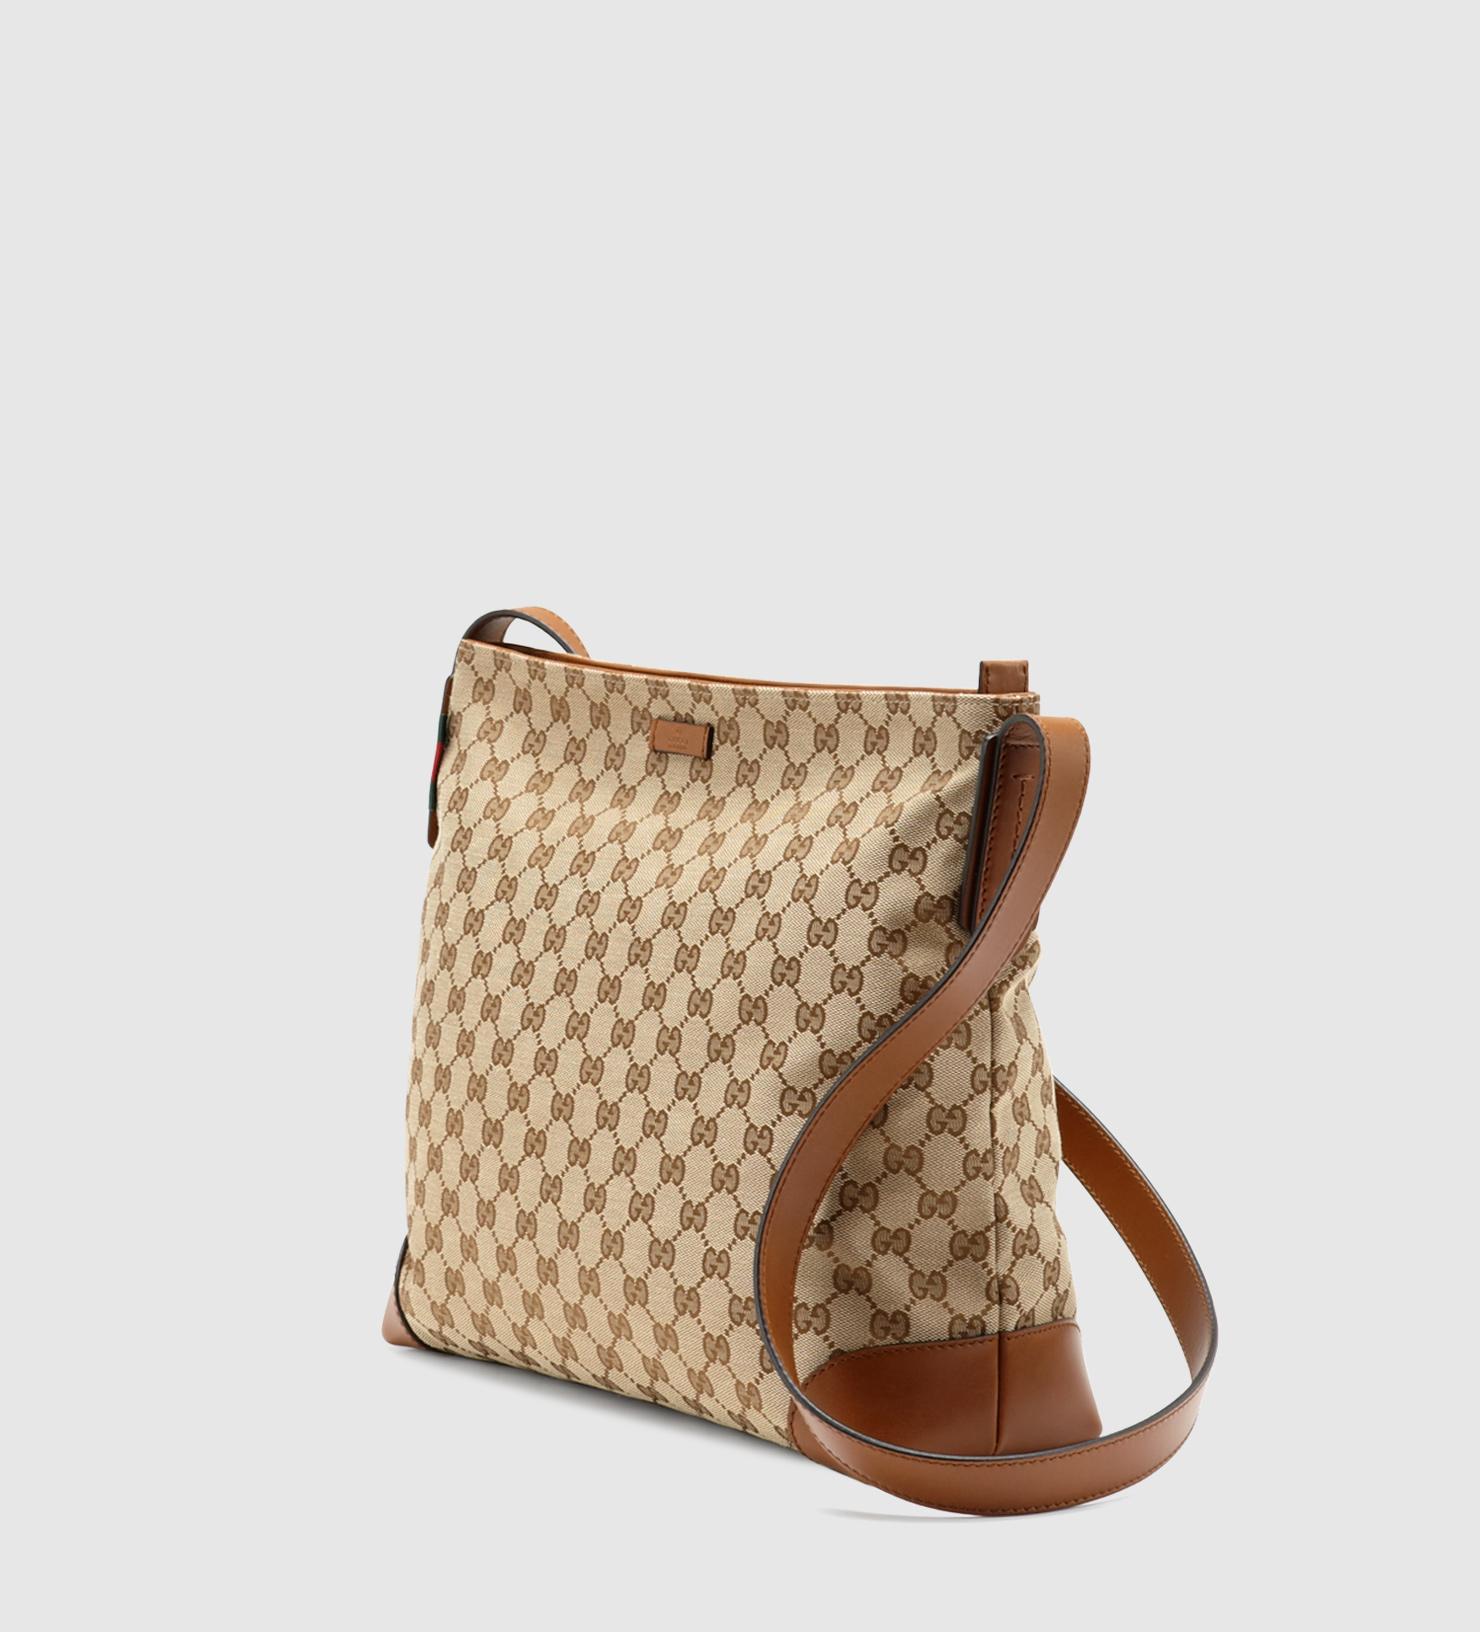 b9d827064127 Gucci Large Original Gg Canvas Messenger Bag in Brown | Lyst